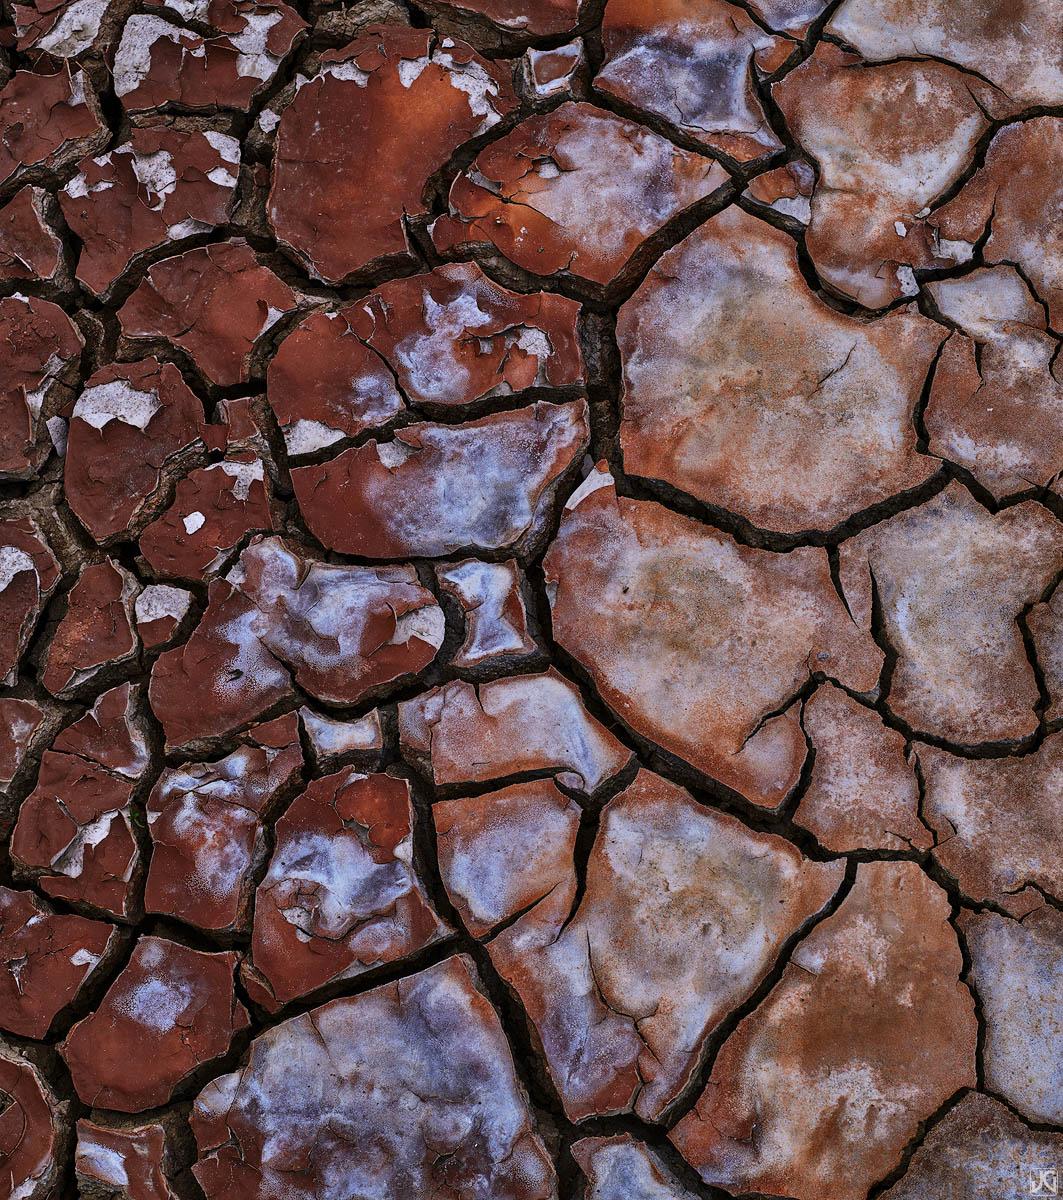 California, anza borrego, mud, desert, playa, photo